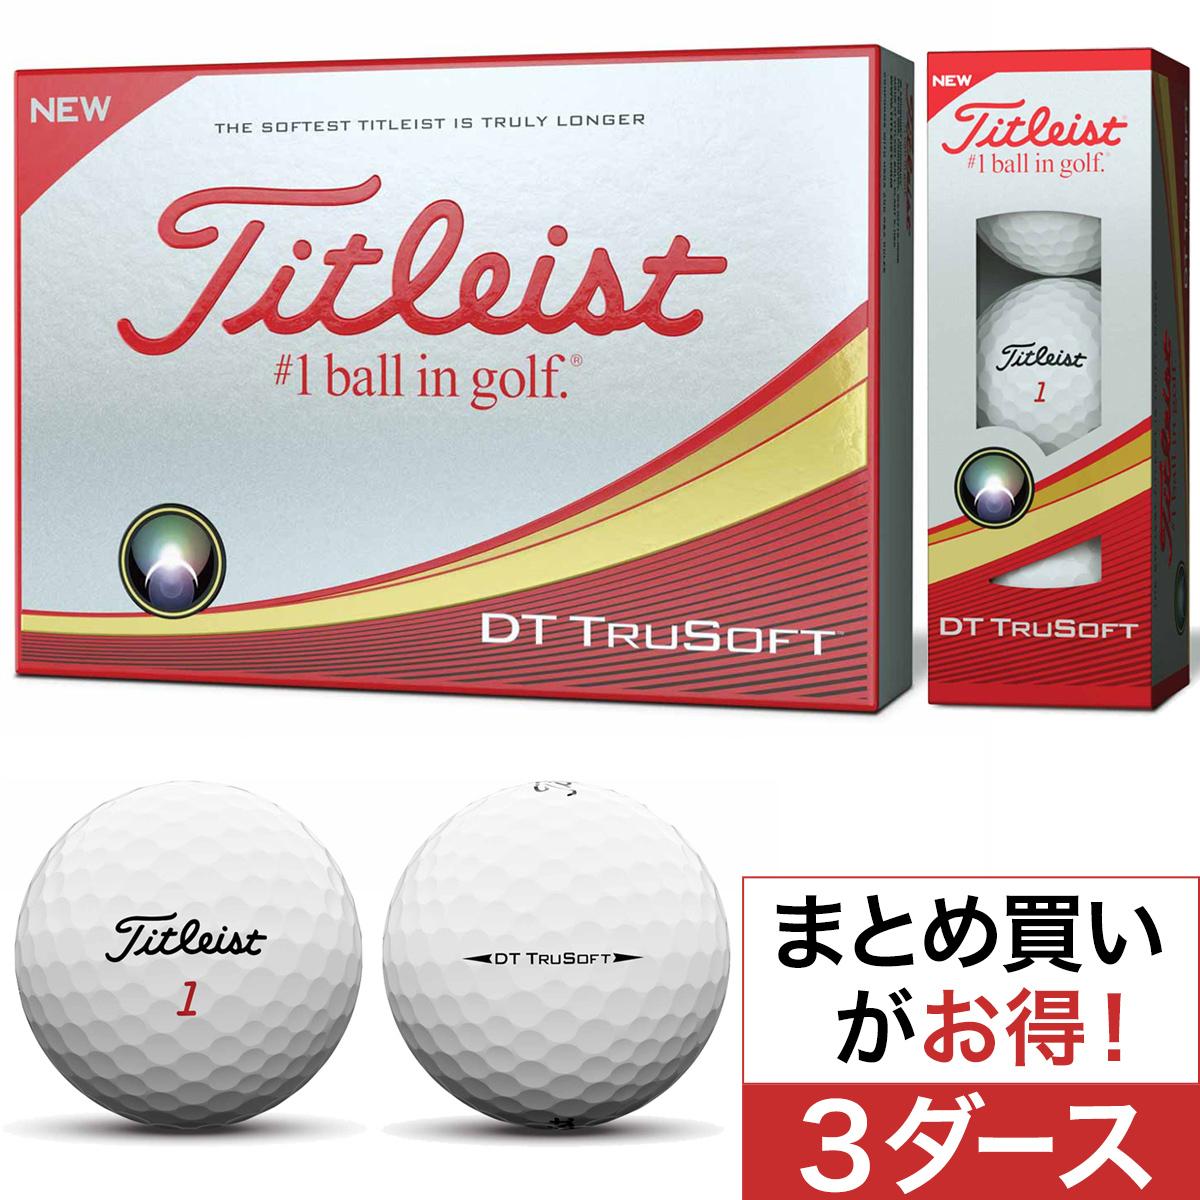 DT TRUSOFT ボール 2018年モデル 3ダース